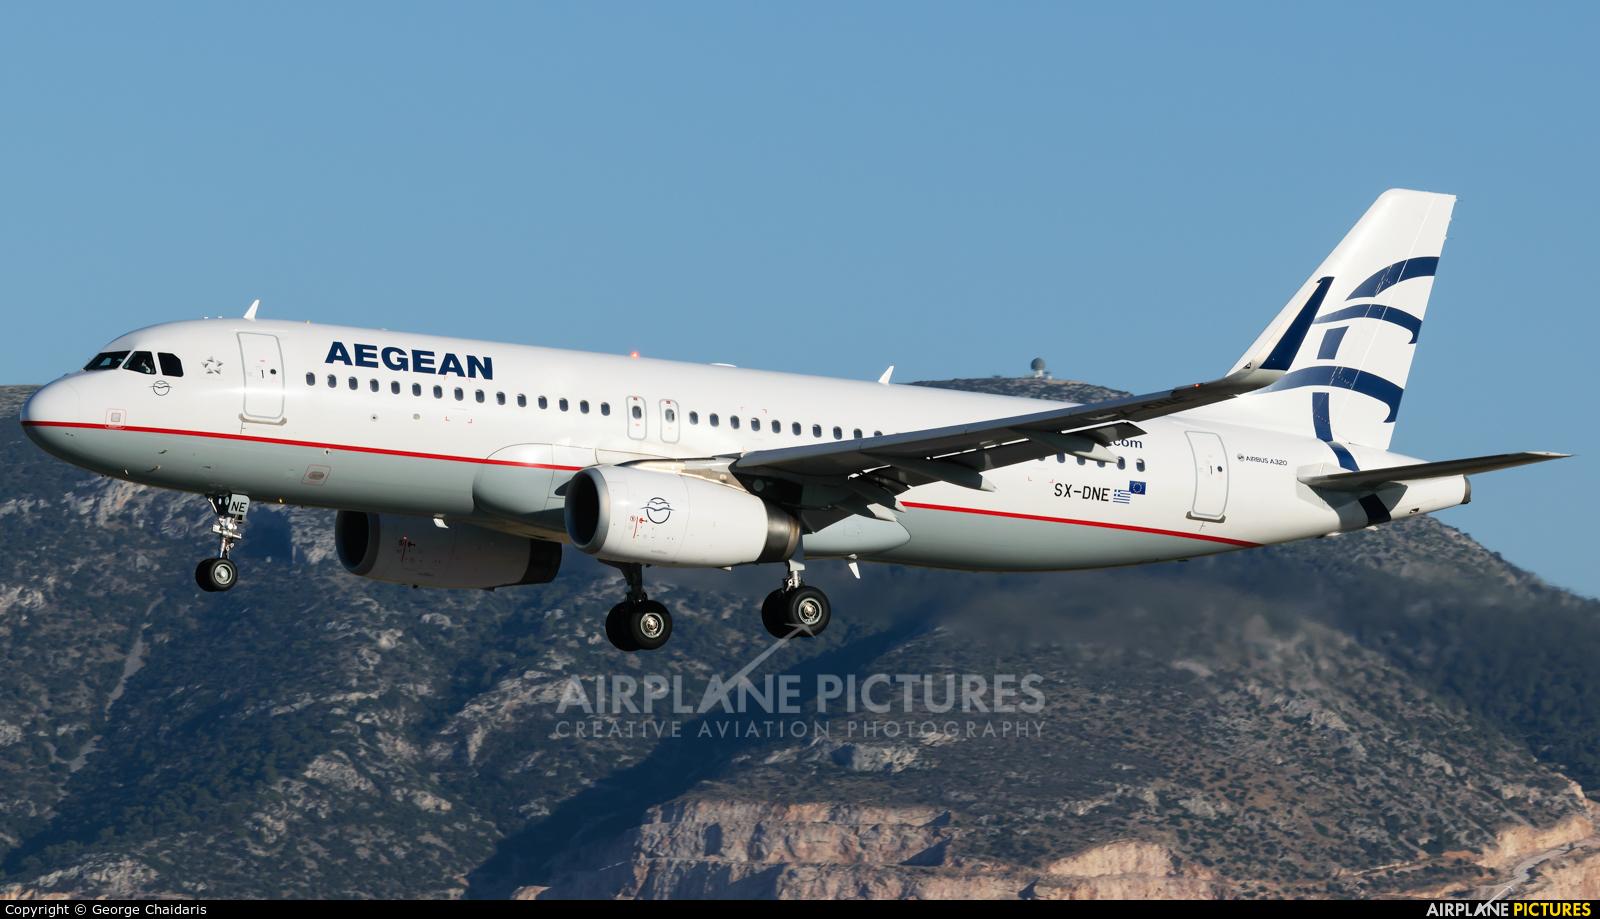 Aegean Airlines SX-DNE aircraft at Athens - Eleftherios Venizelos